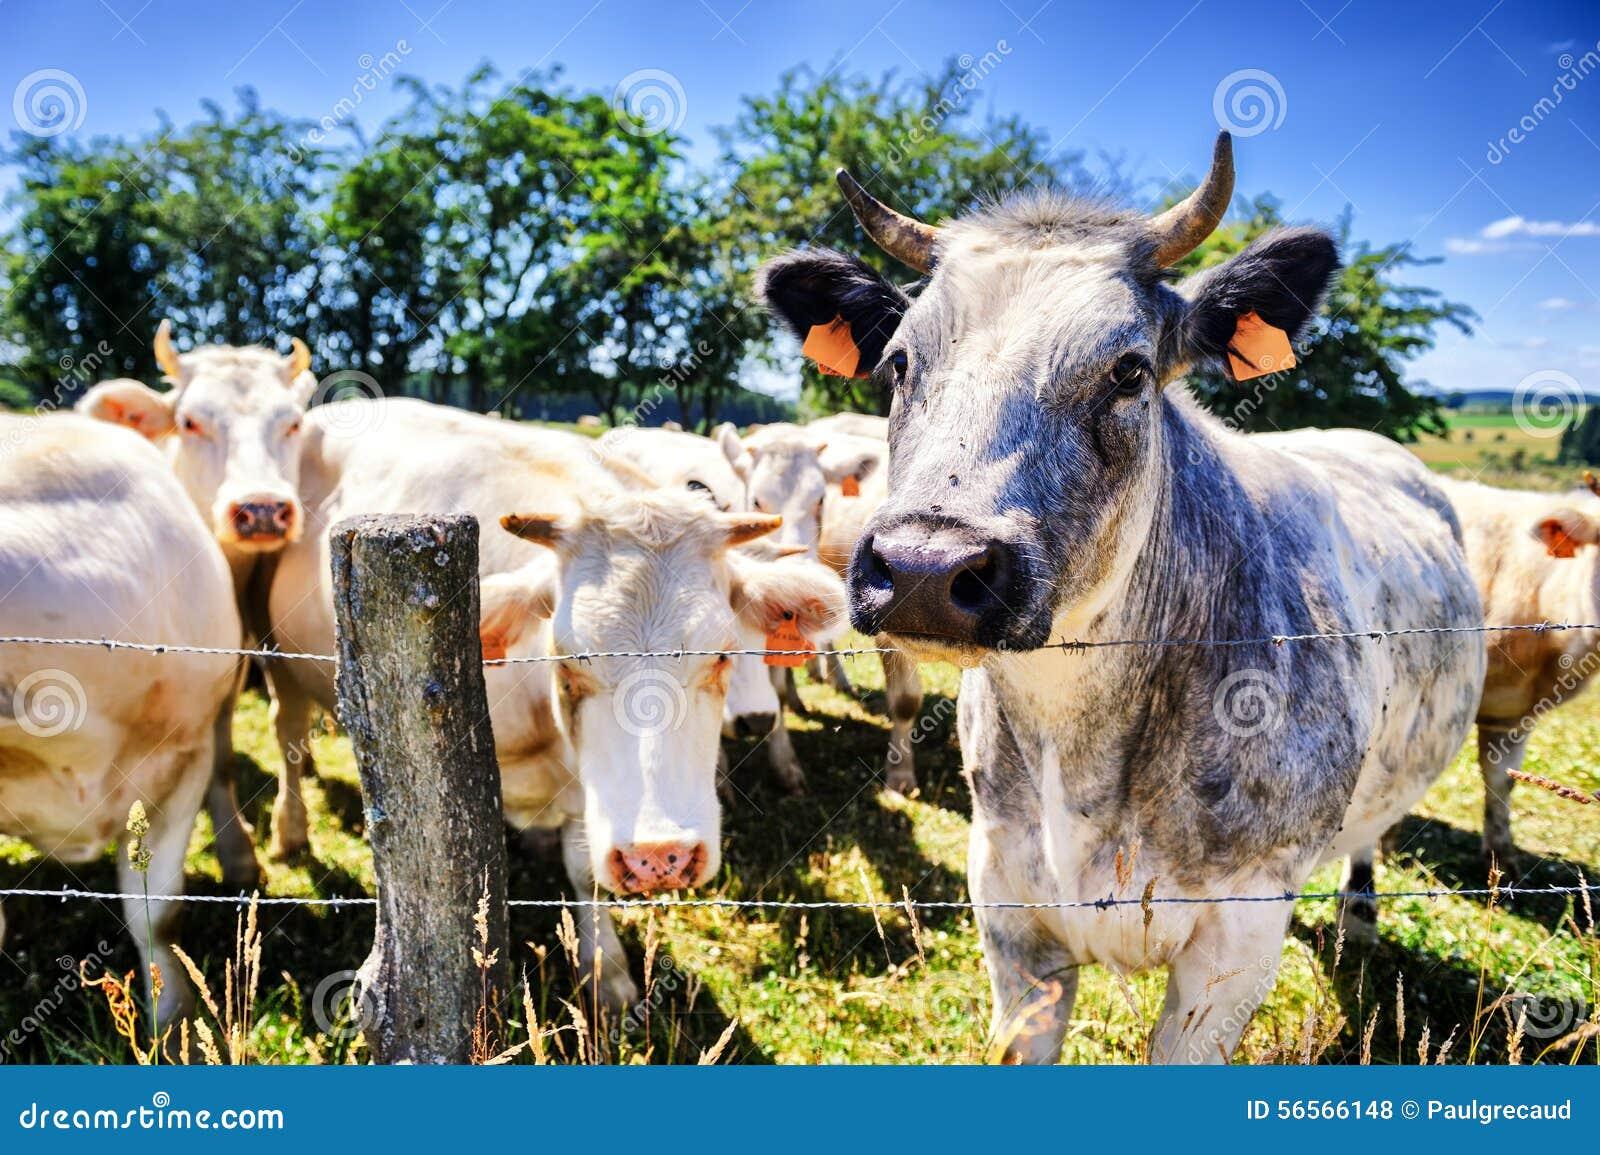 Download Κοπάδι των αγελάδων στο θερινό πράσινο τομέα Στοκ Εικόνες - εικόνα από πεδίο, ελάχιστα: 56566148